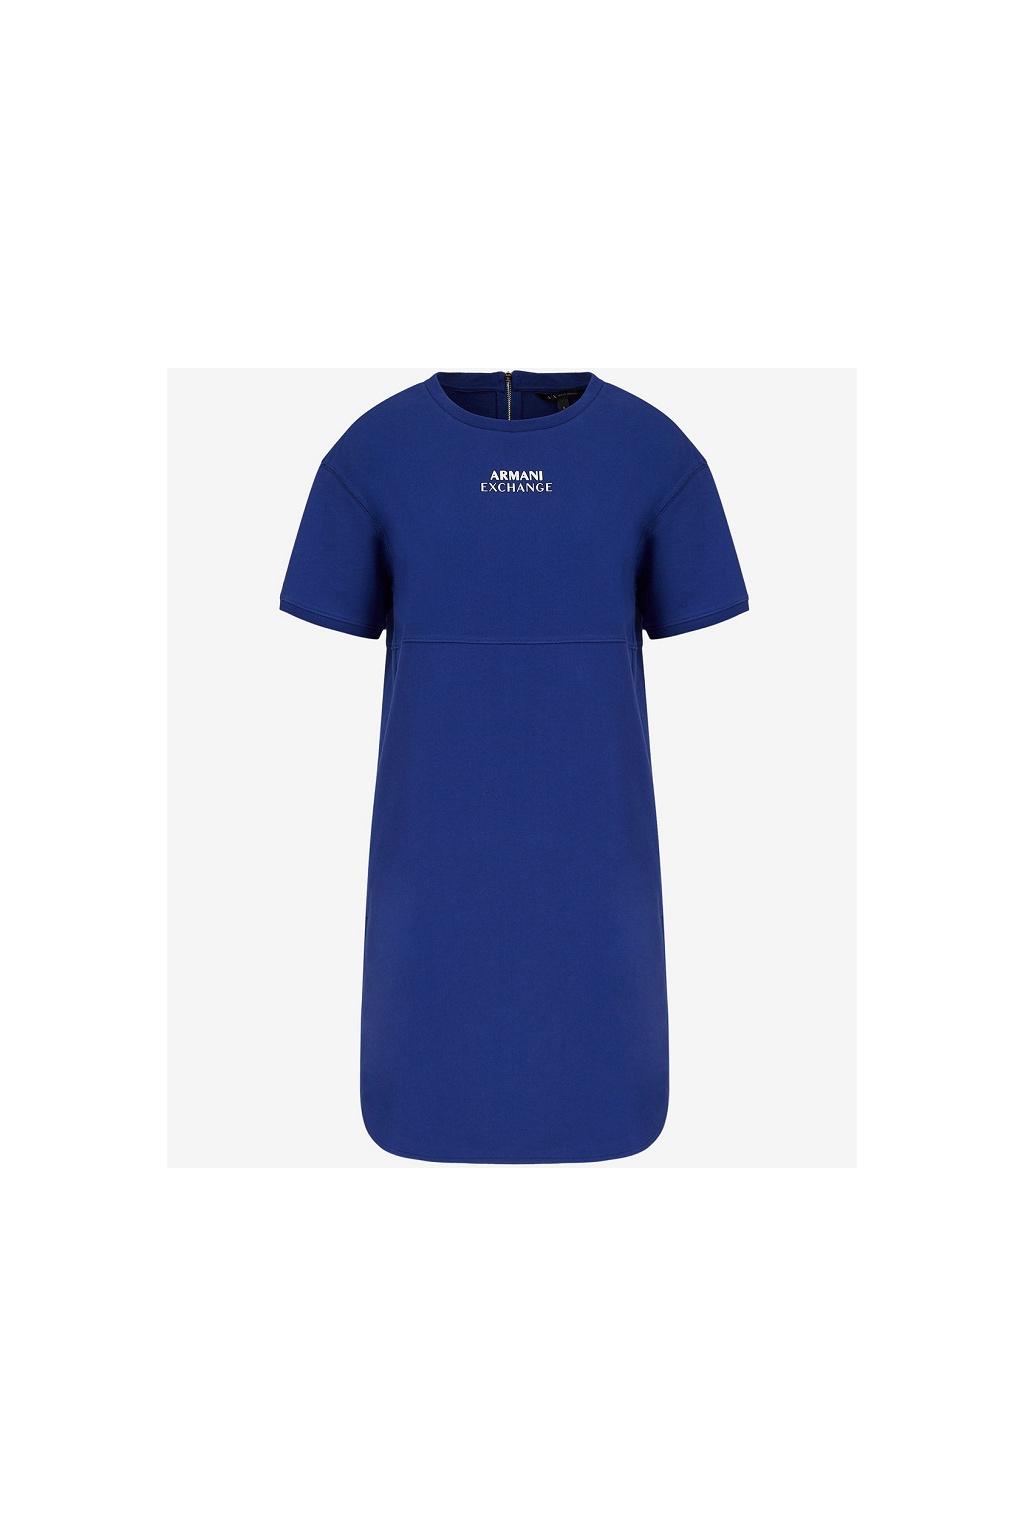 Dámské šaty Armani Exchange 3KYA79 YJ7EZ modré